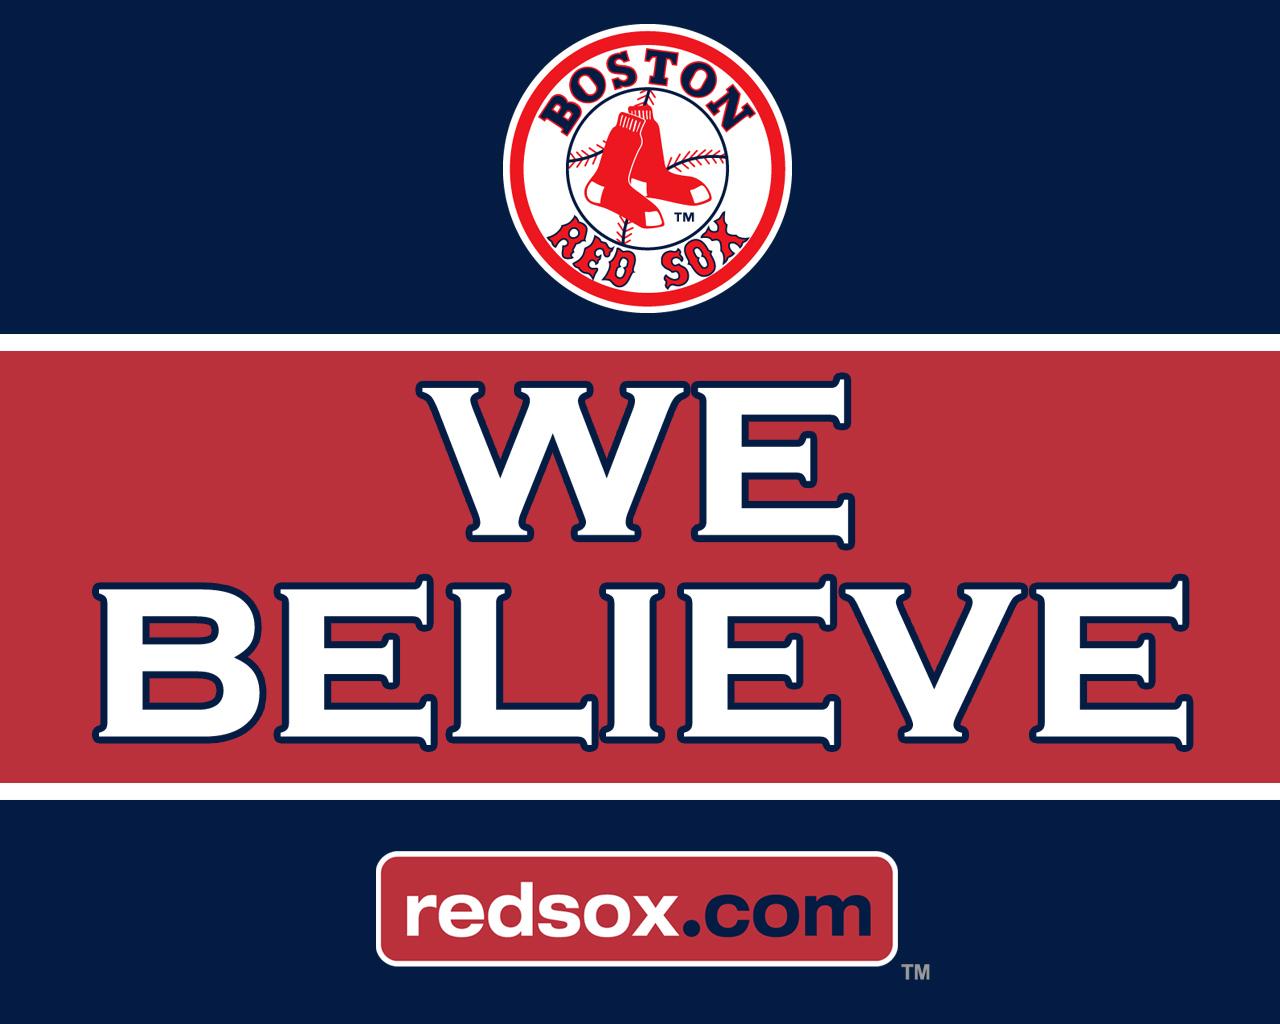 wallpapers baseball mlb mobile boston red sox boston red sox boston 1280x1024